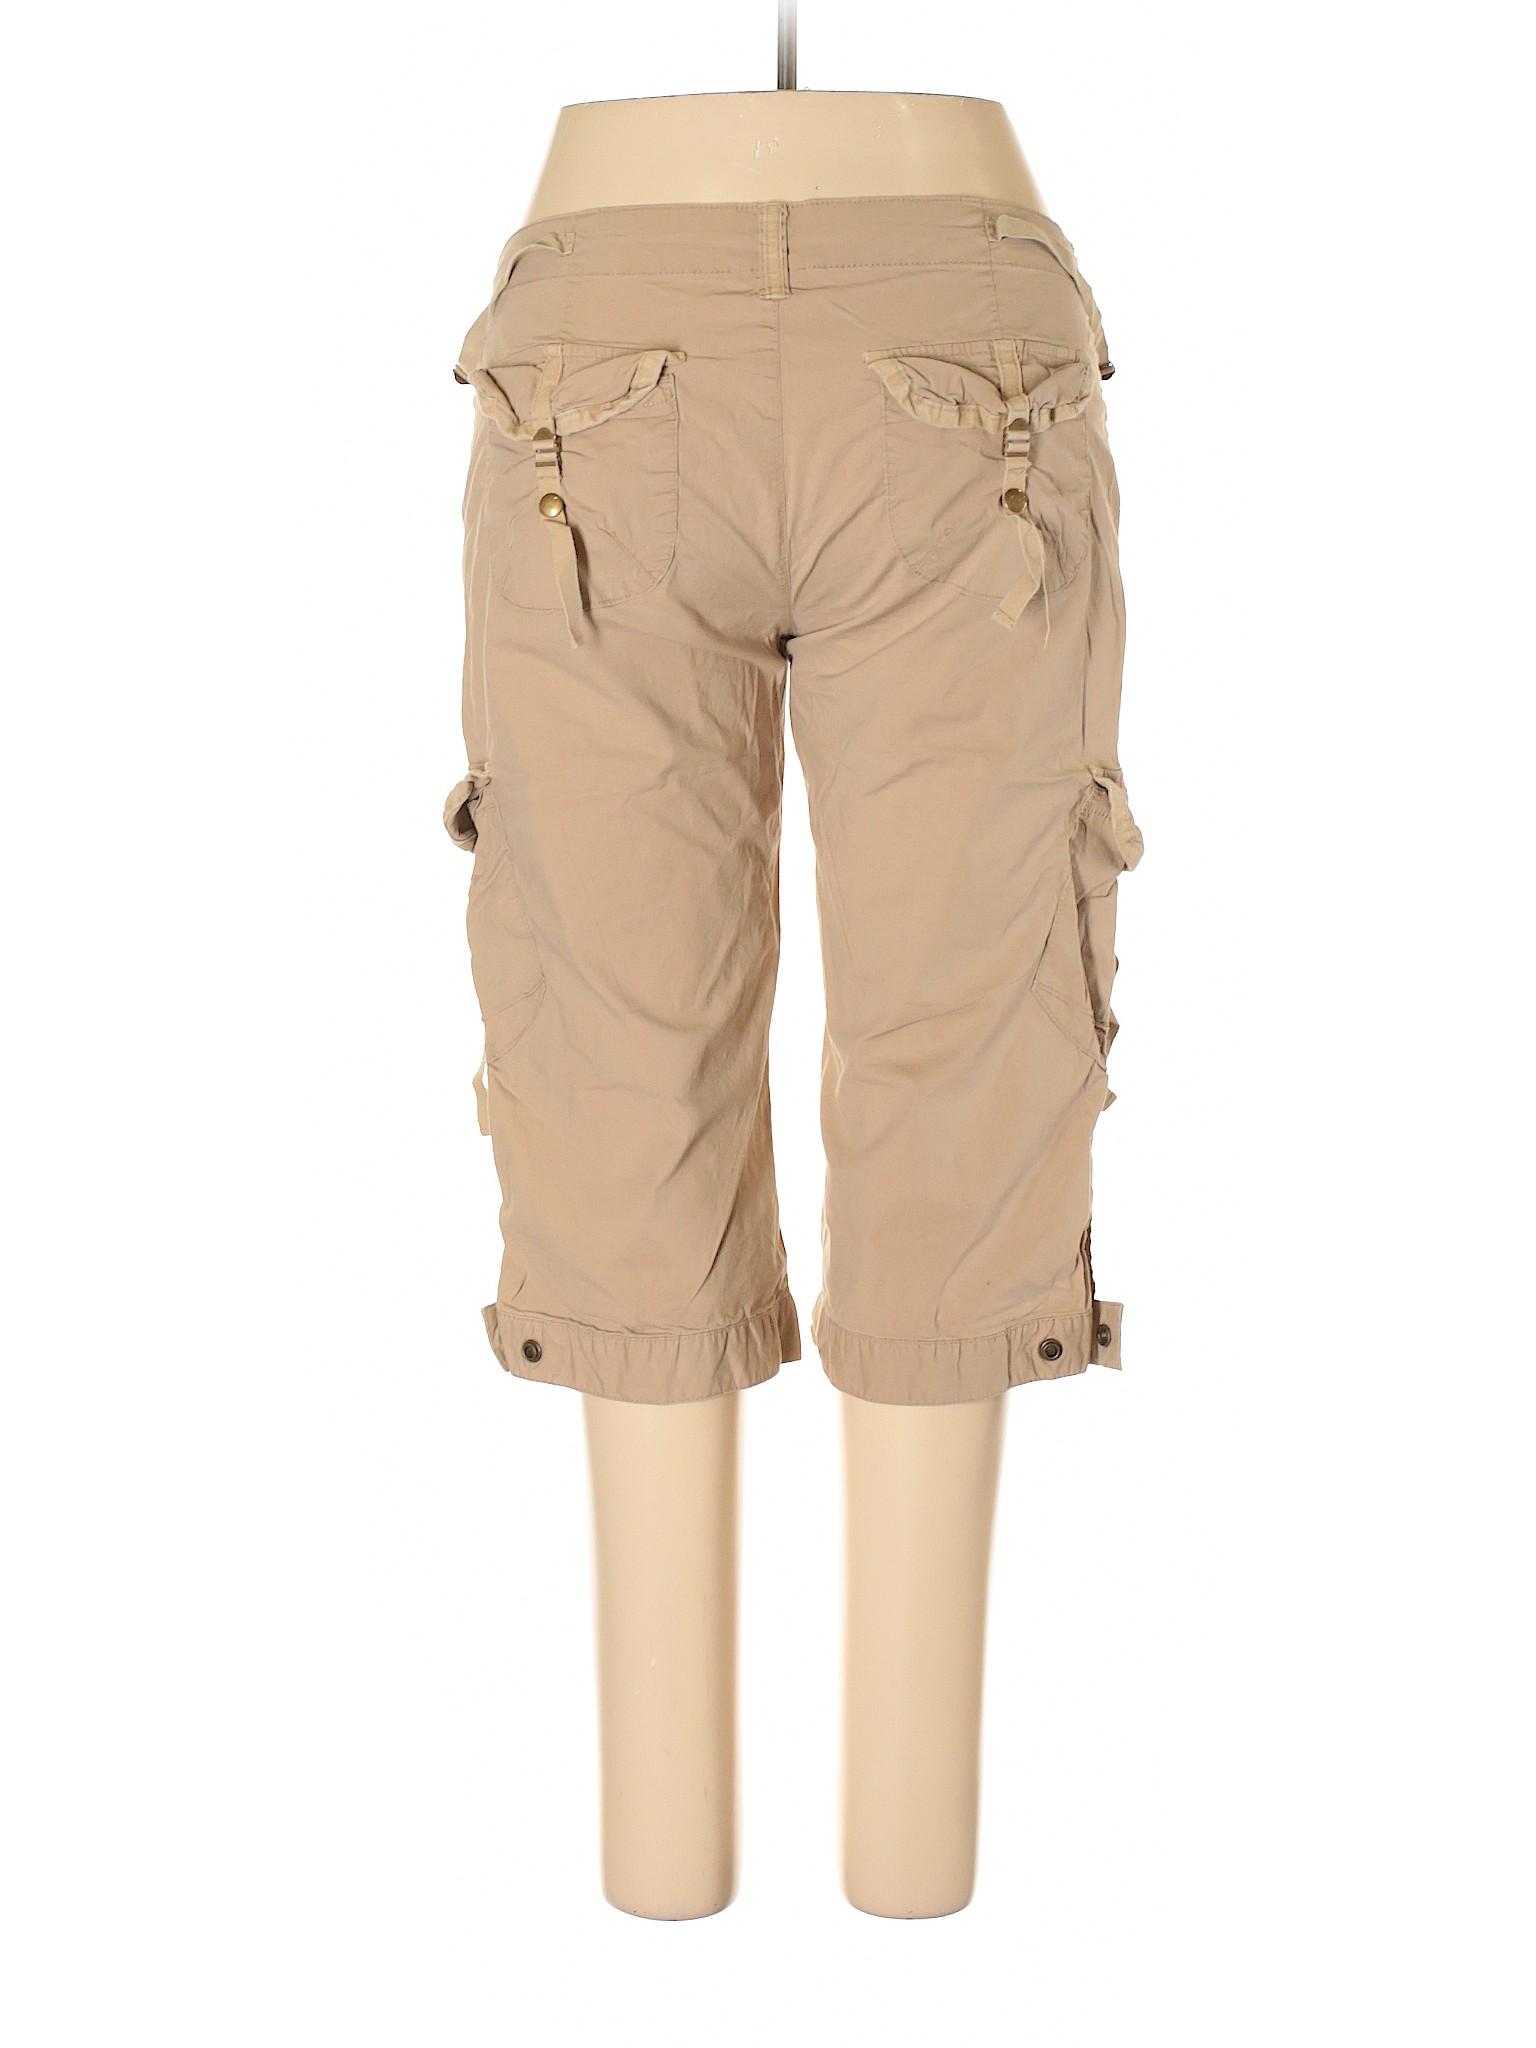 Pants Cargo Pants Navy Old Old Cargo Navy Boutique Boutique Old Boutique HZUAPvnq